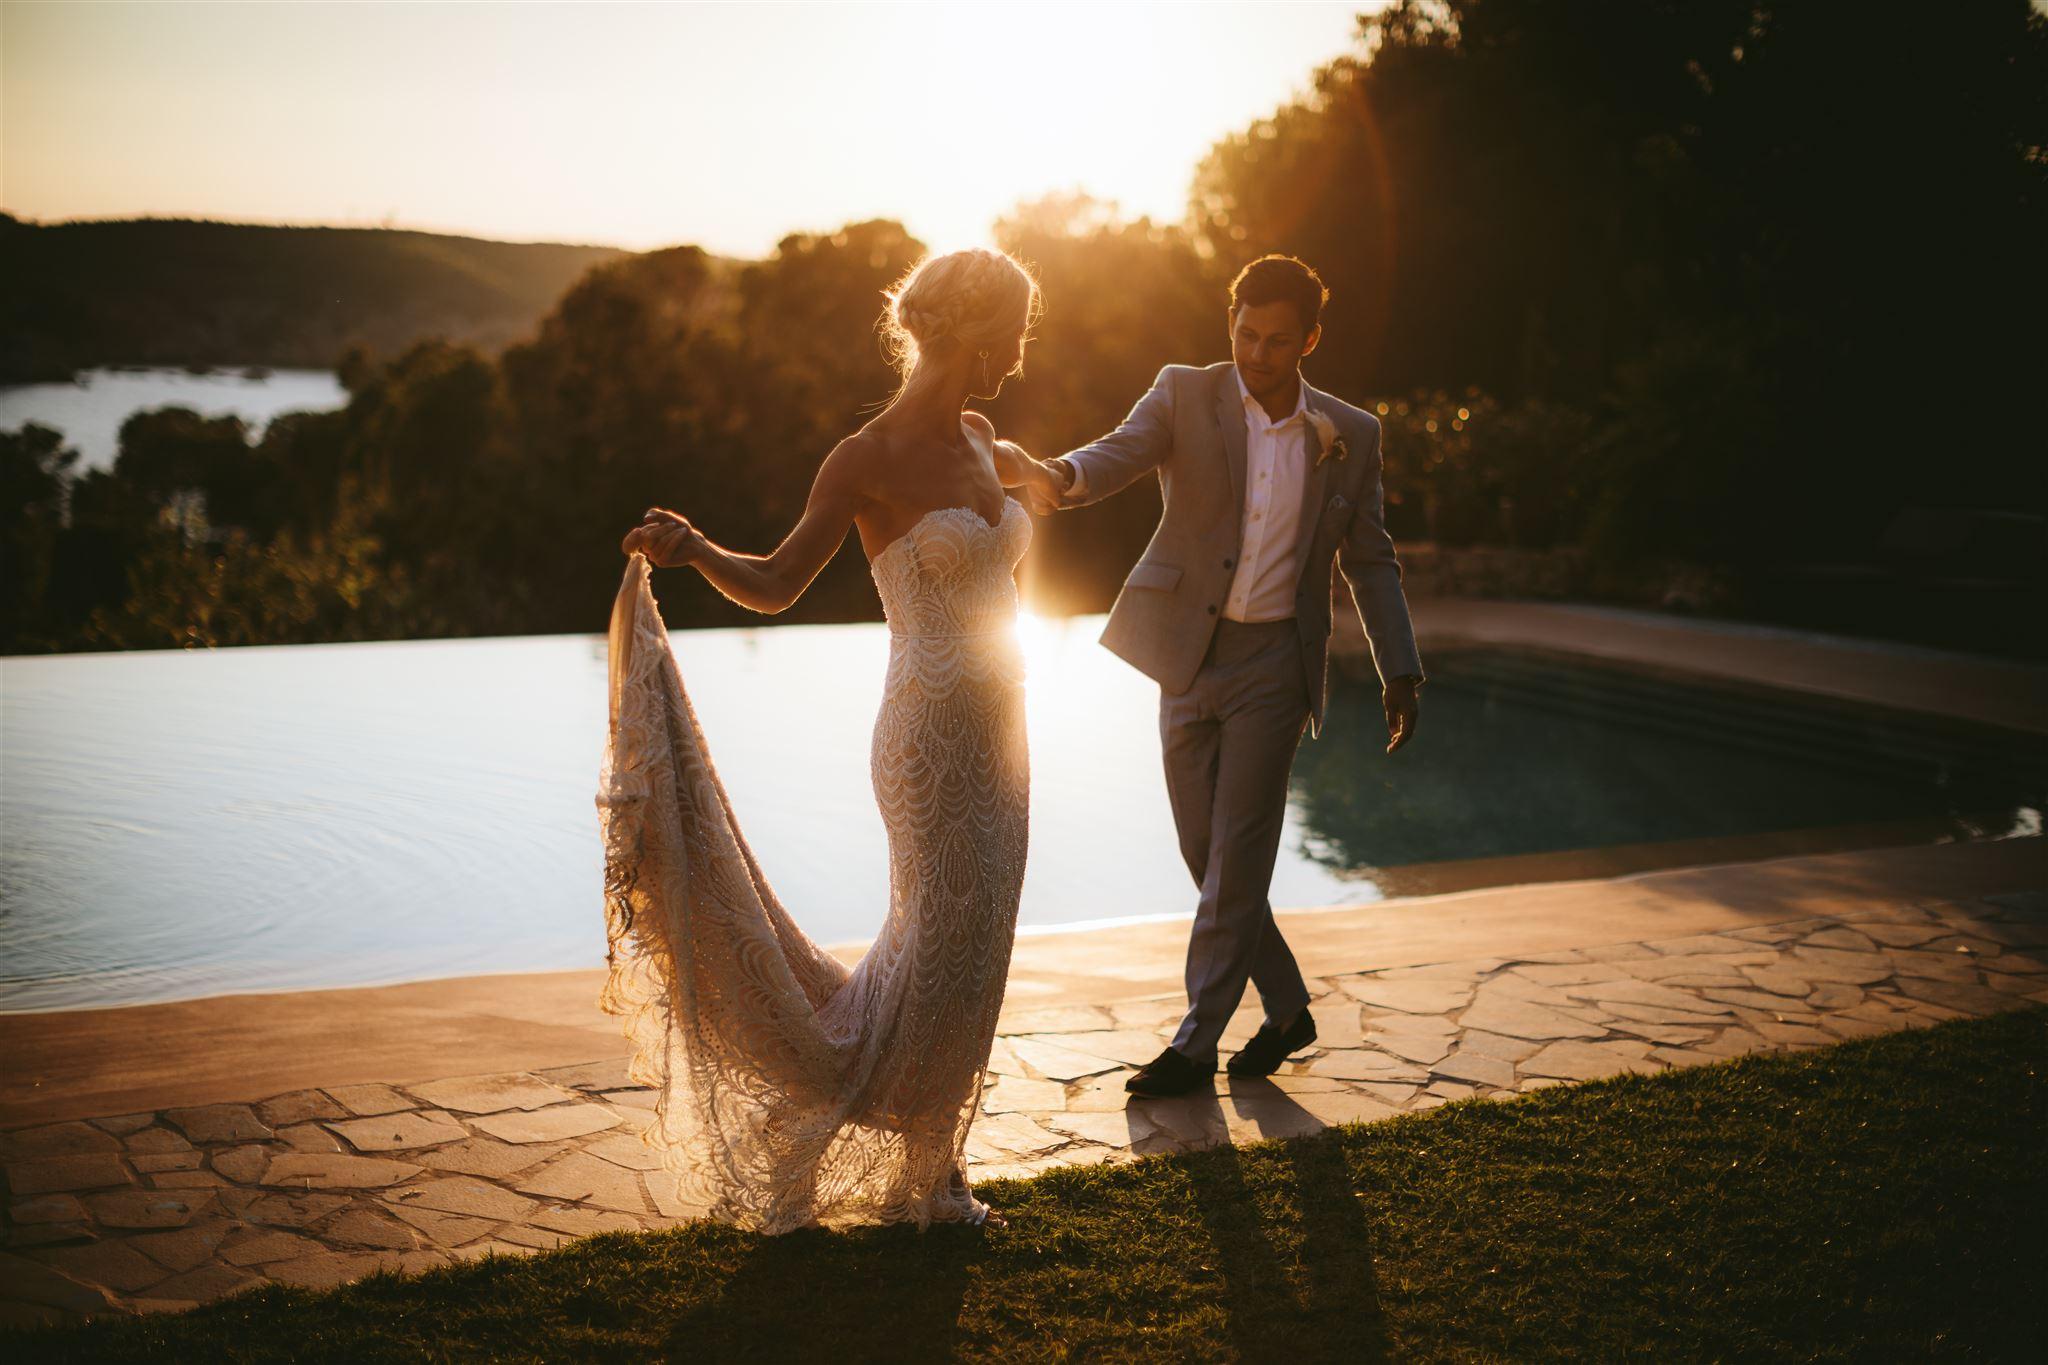 bespoke-tailor-wedding-suit-susannah-hall-harrsions-destination-style-british-made-uk.jpg